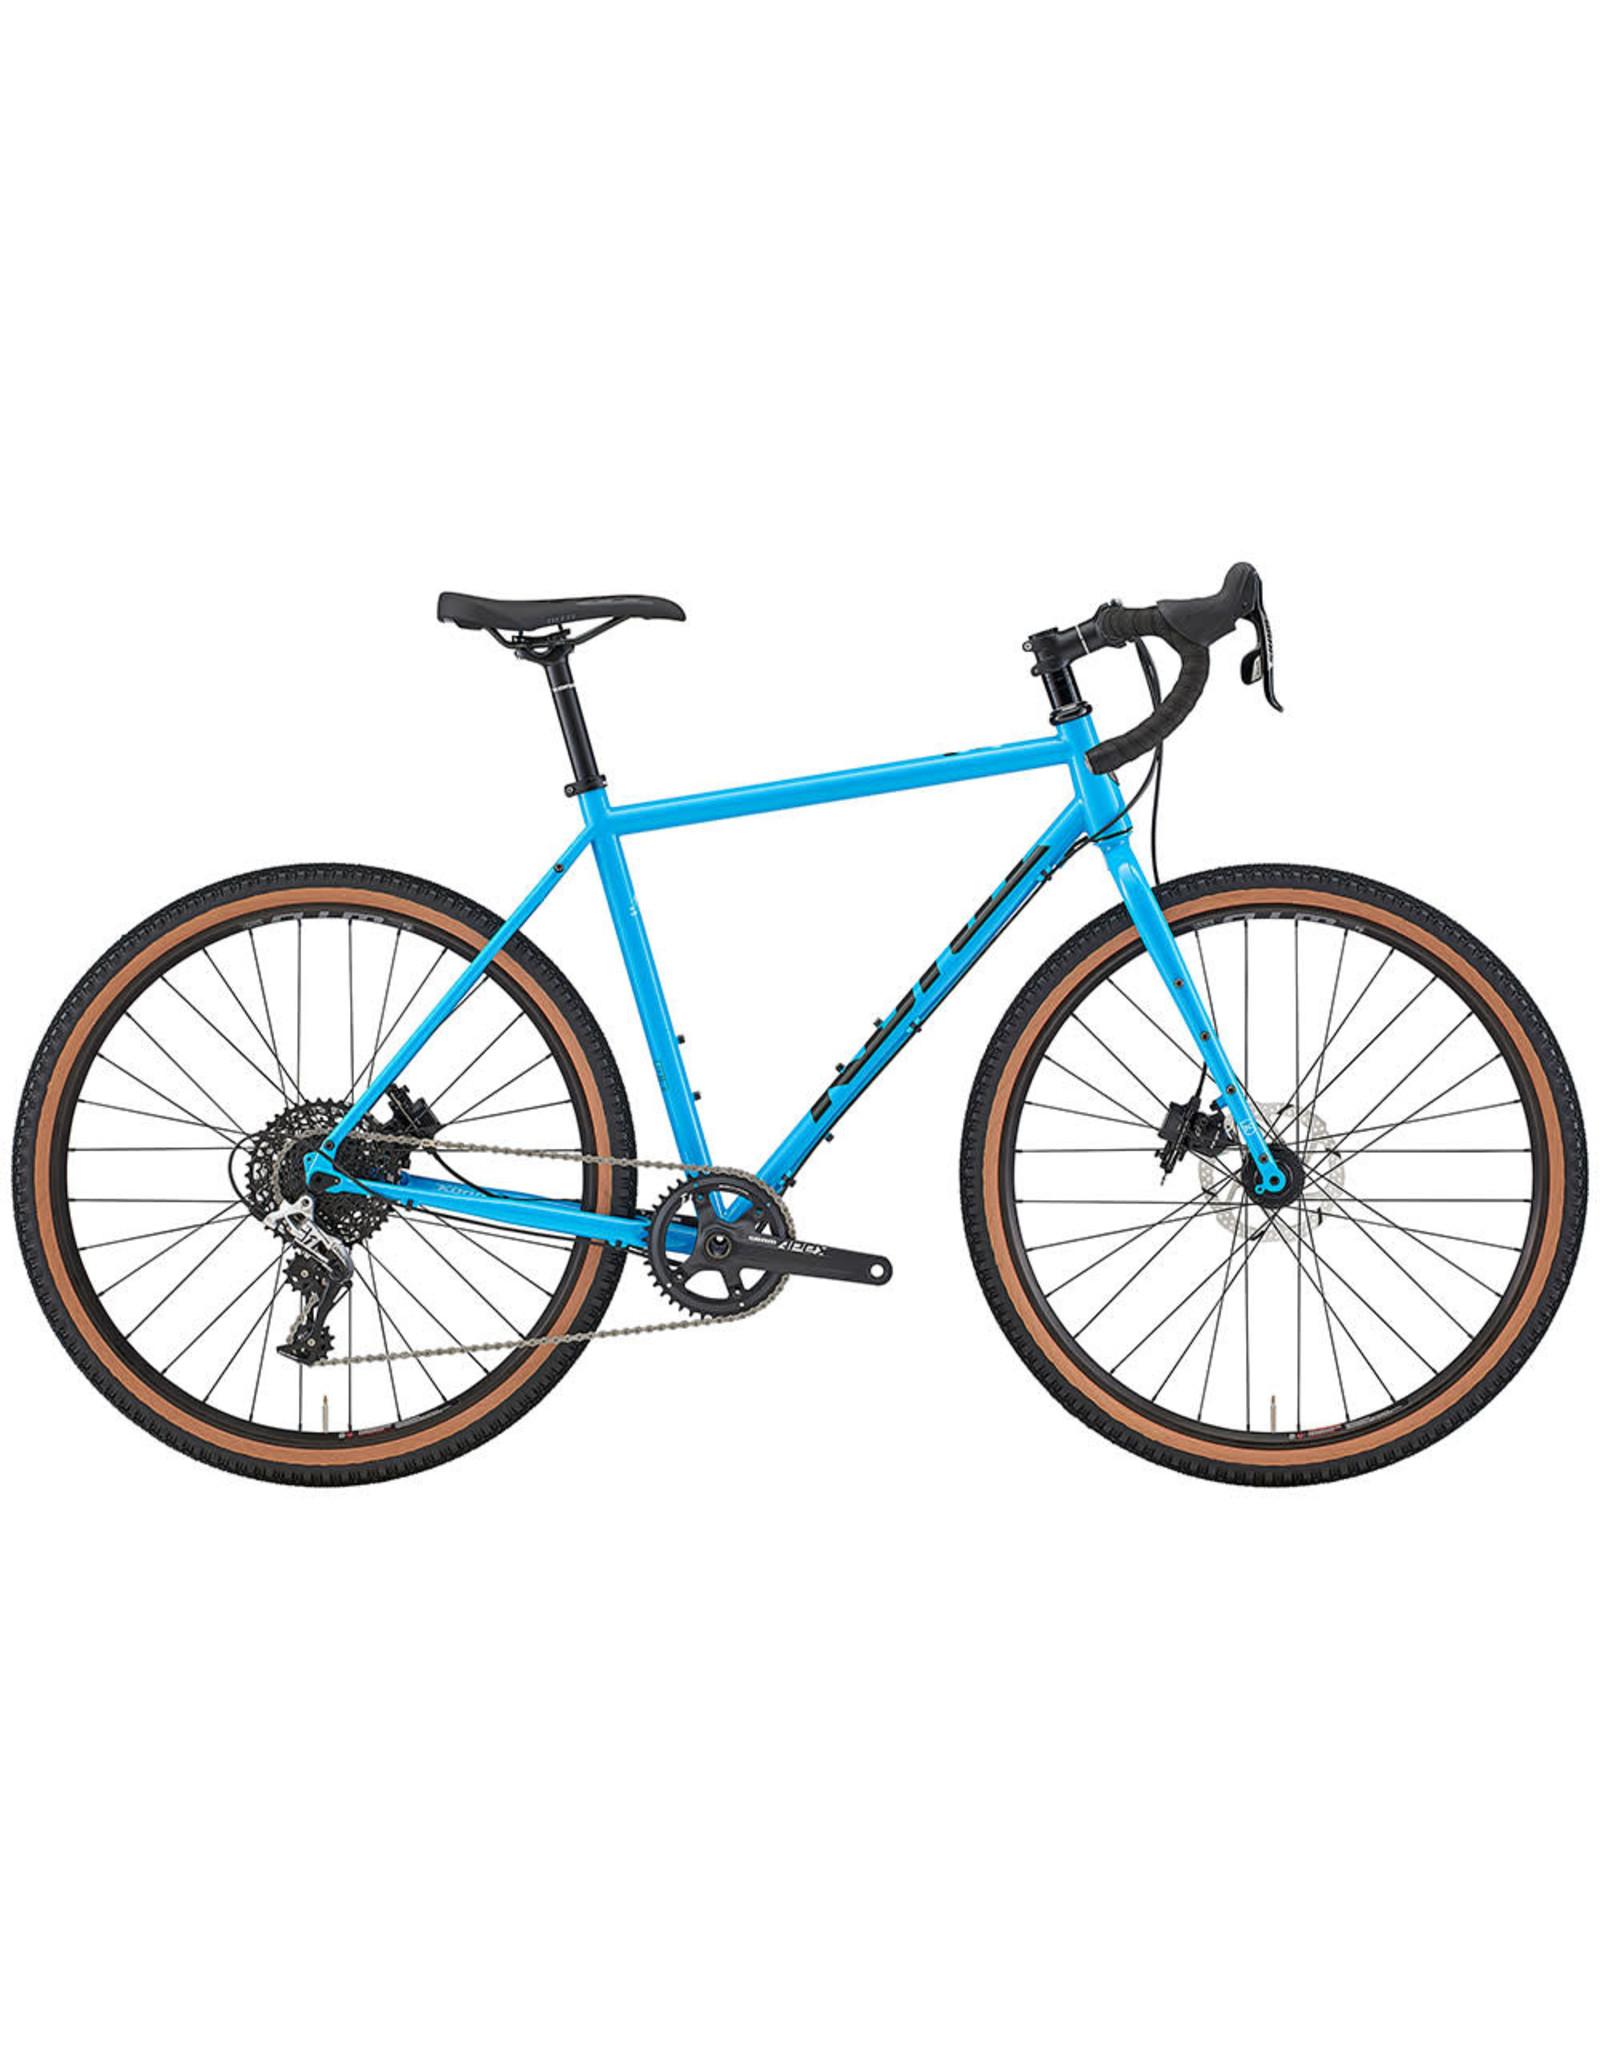 Kona bikes Rove DL 54cm Gloss Azure Blue